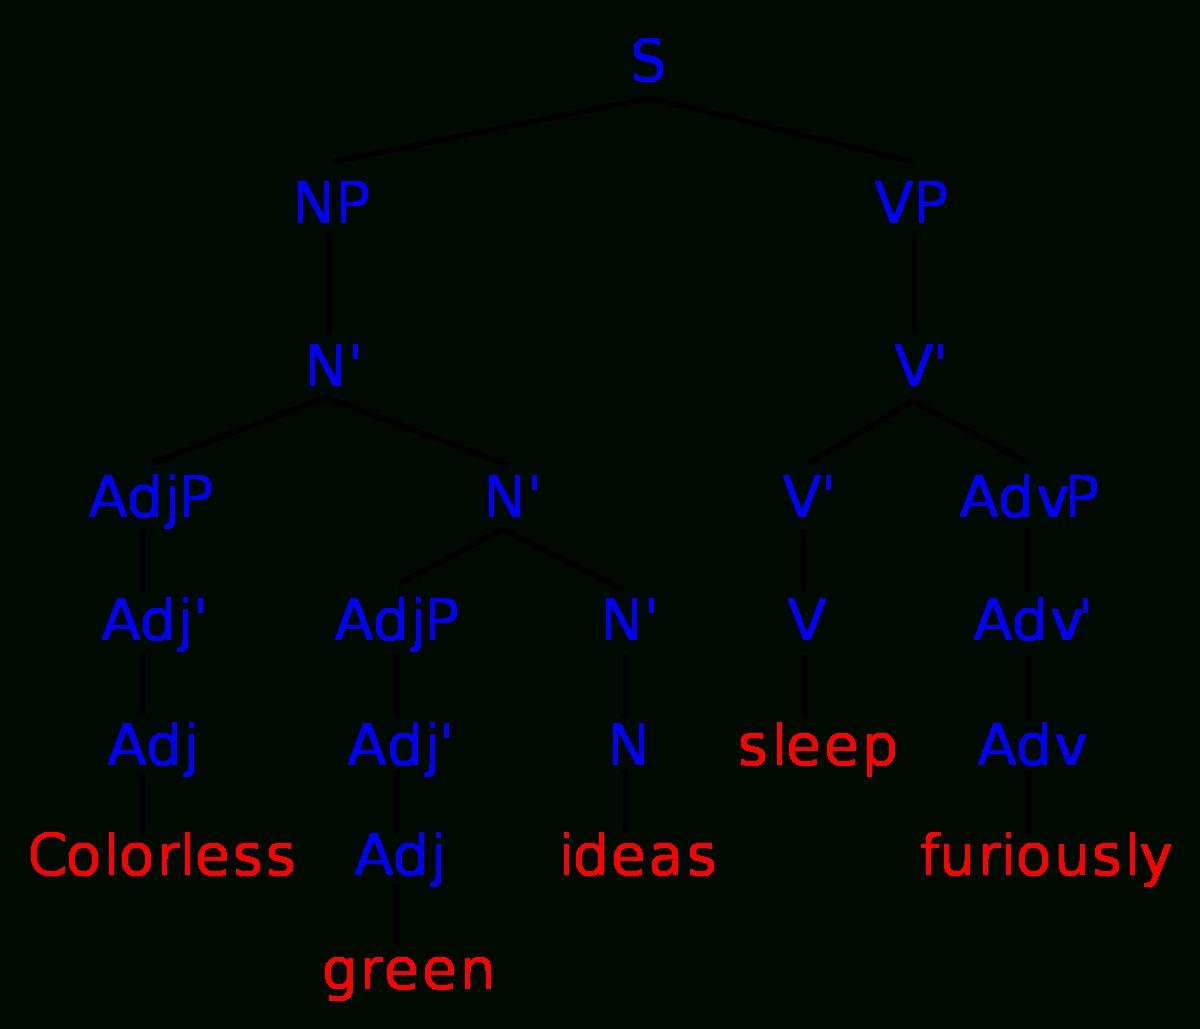 10 Gorgeous Colorless Green Ideas Sleep Furiously colorless green ideas sleep furiously wikipedia 2021